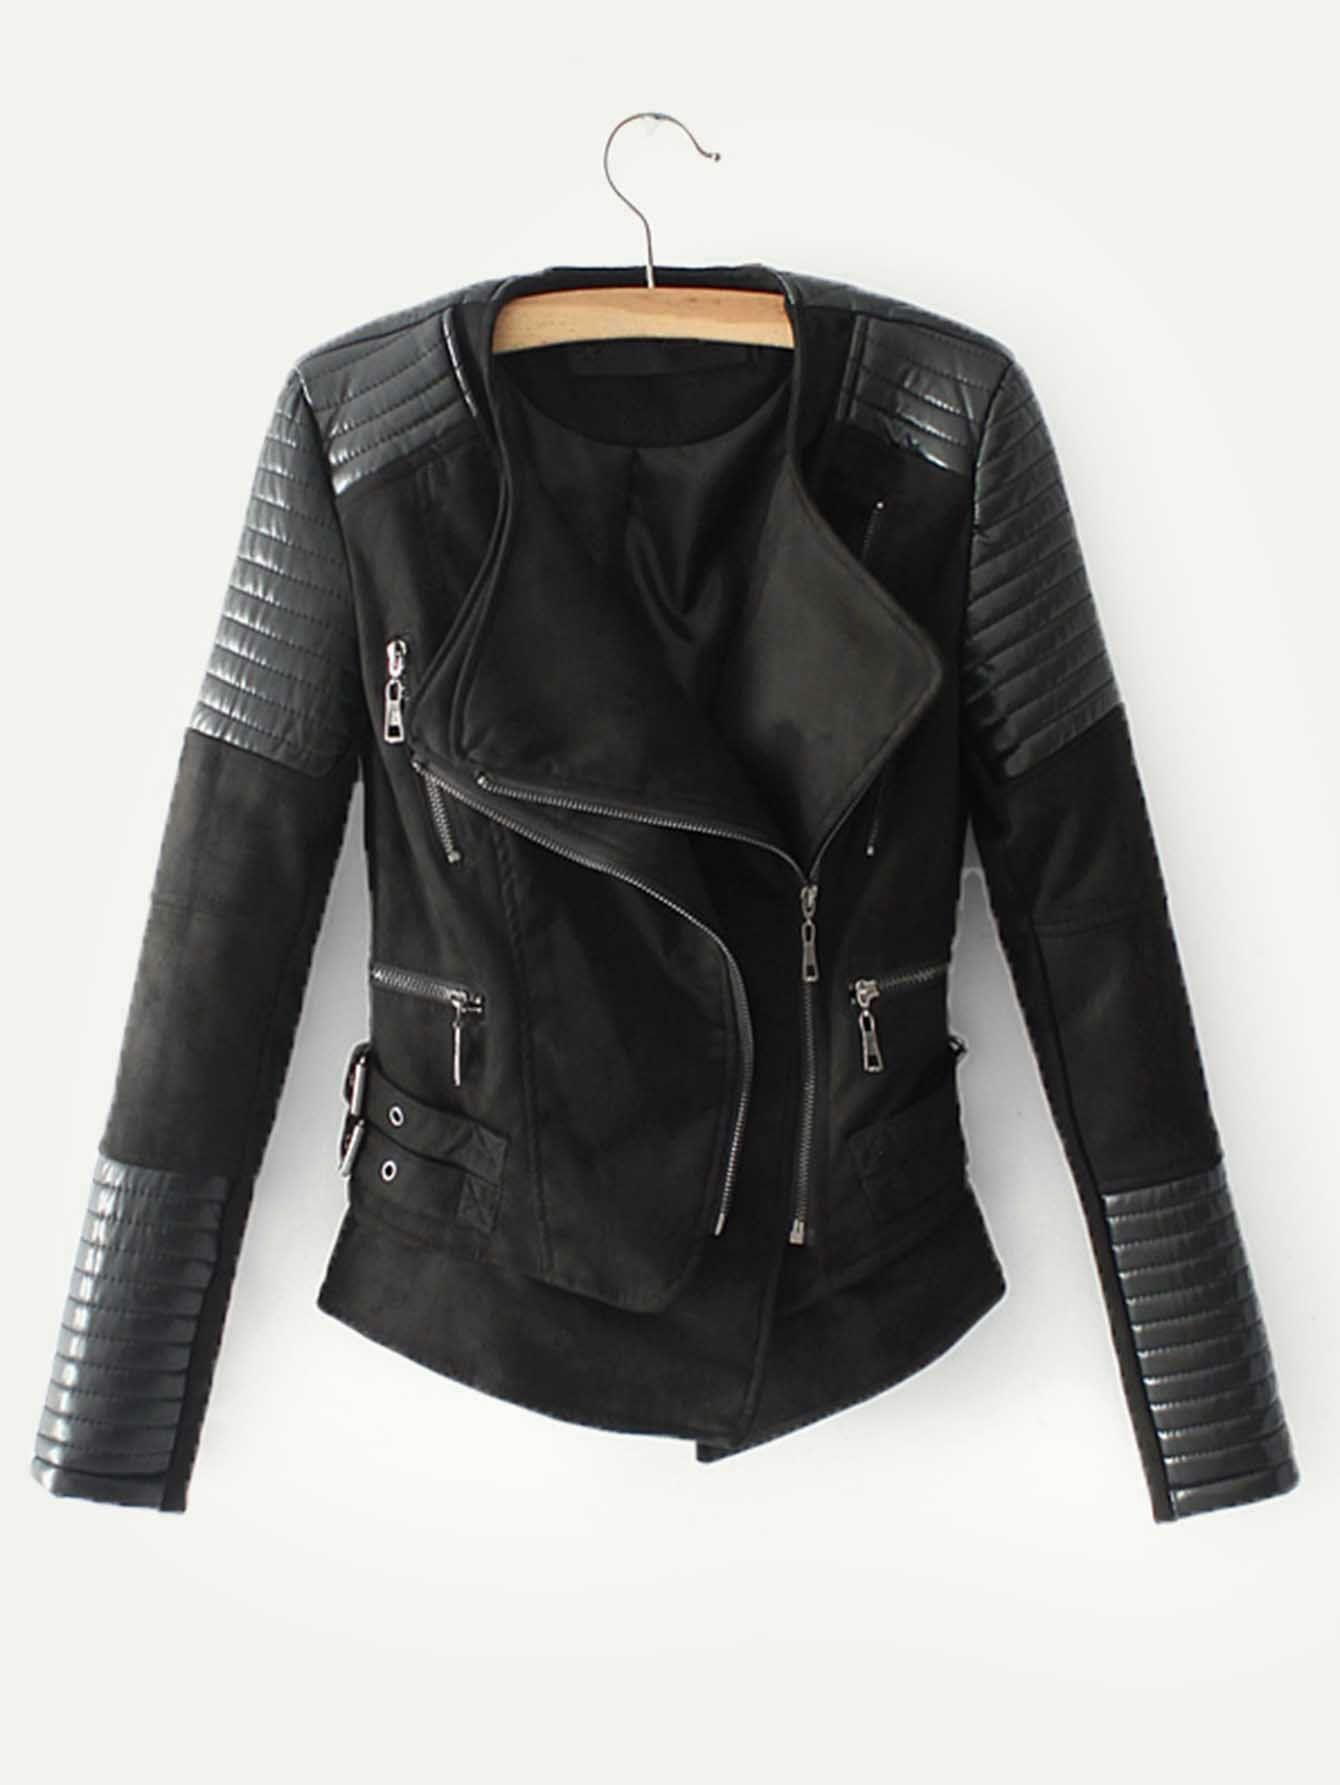 HYDSFG Spring Autumn Leather Jacket Women Long Sleeve Zipper Brown Faux Leather Coats Ladies Motorcycle Biker